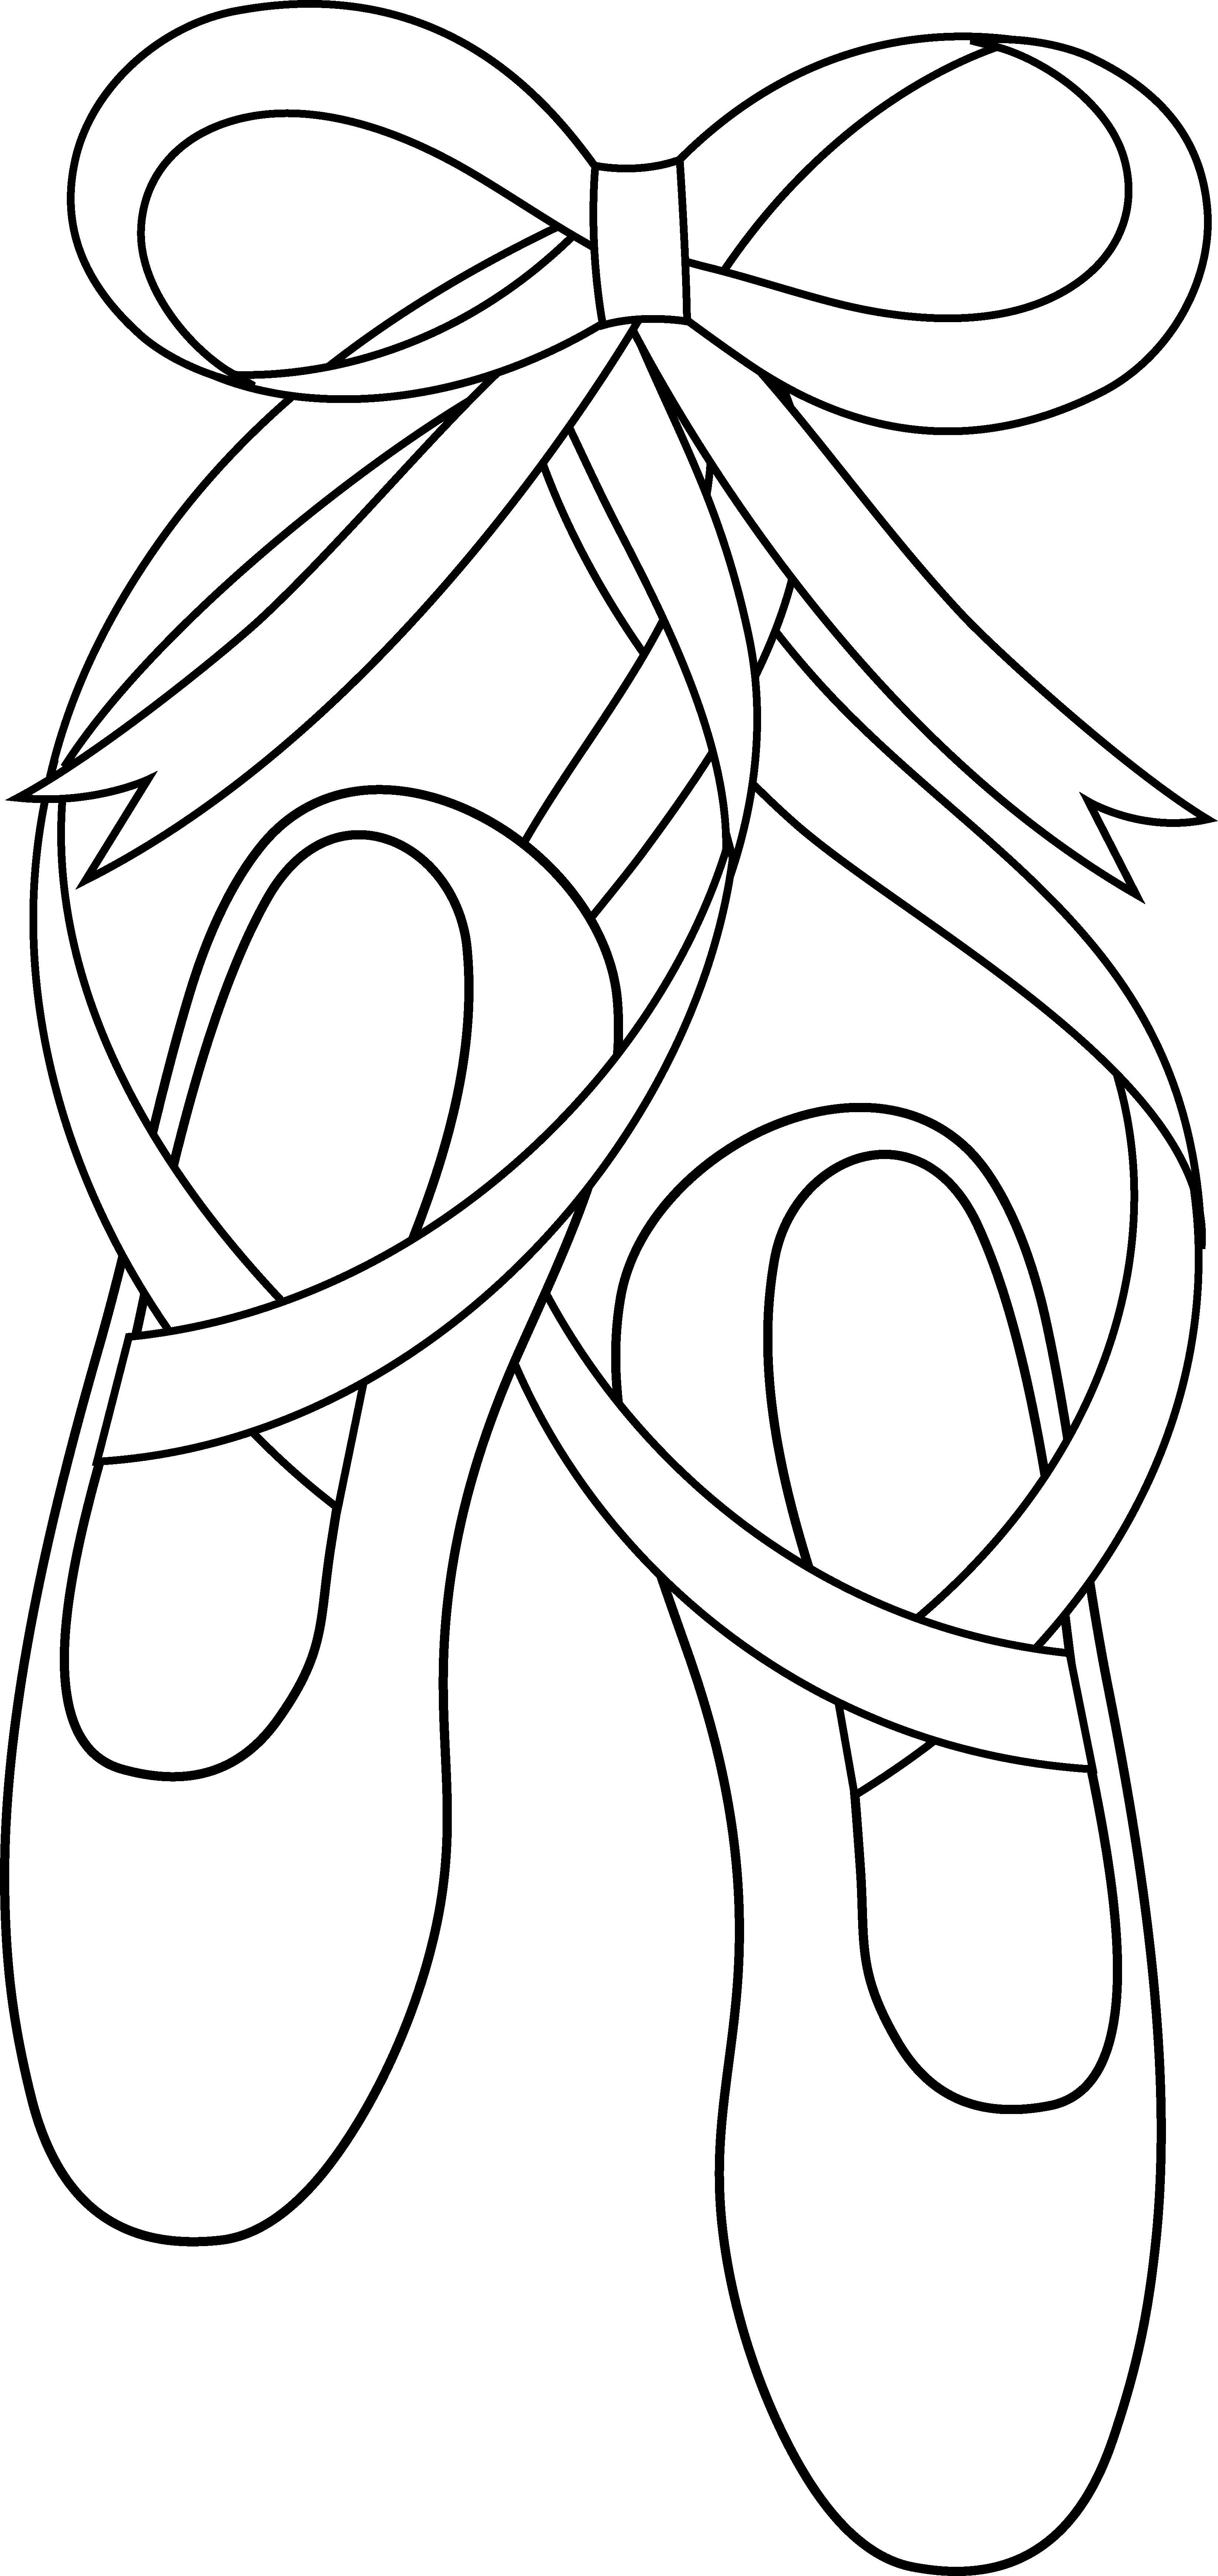 cartoon ballet shoes clipart best balerine pinterest ballet rh pinterest com cartoon ballet shoes images pictures of cartoon ballet shoes